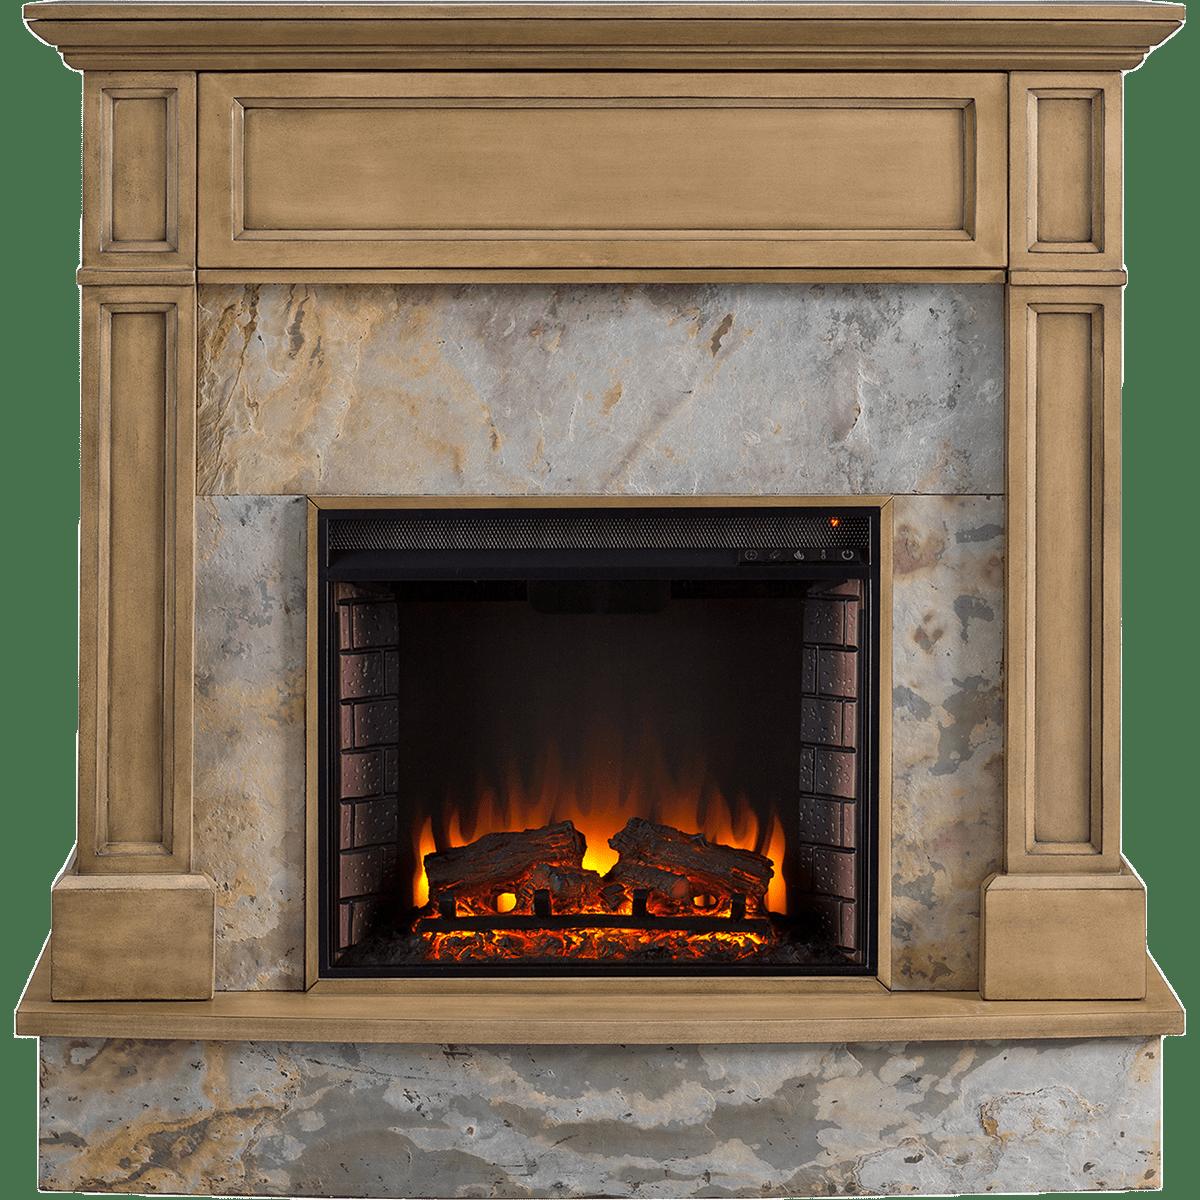 Sei Holden Stone Media Fireplace Sylvane